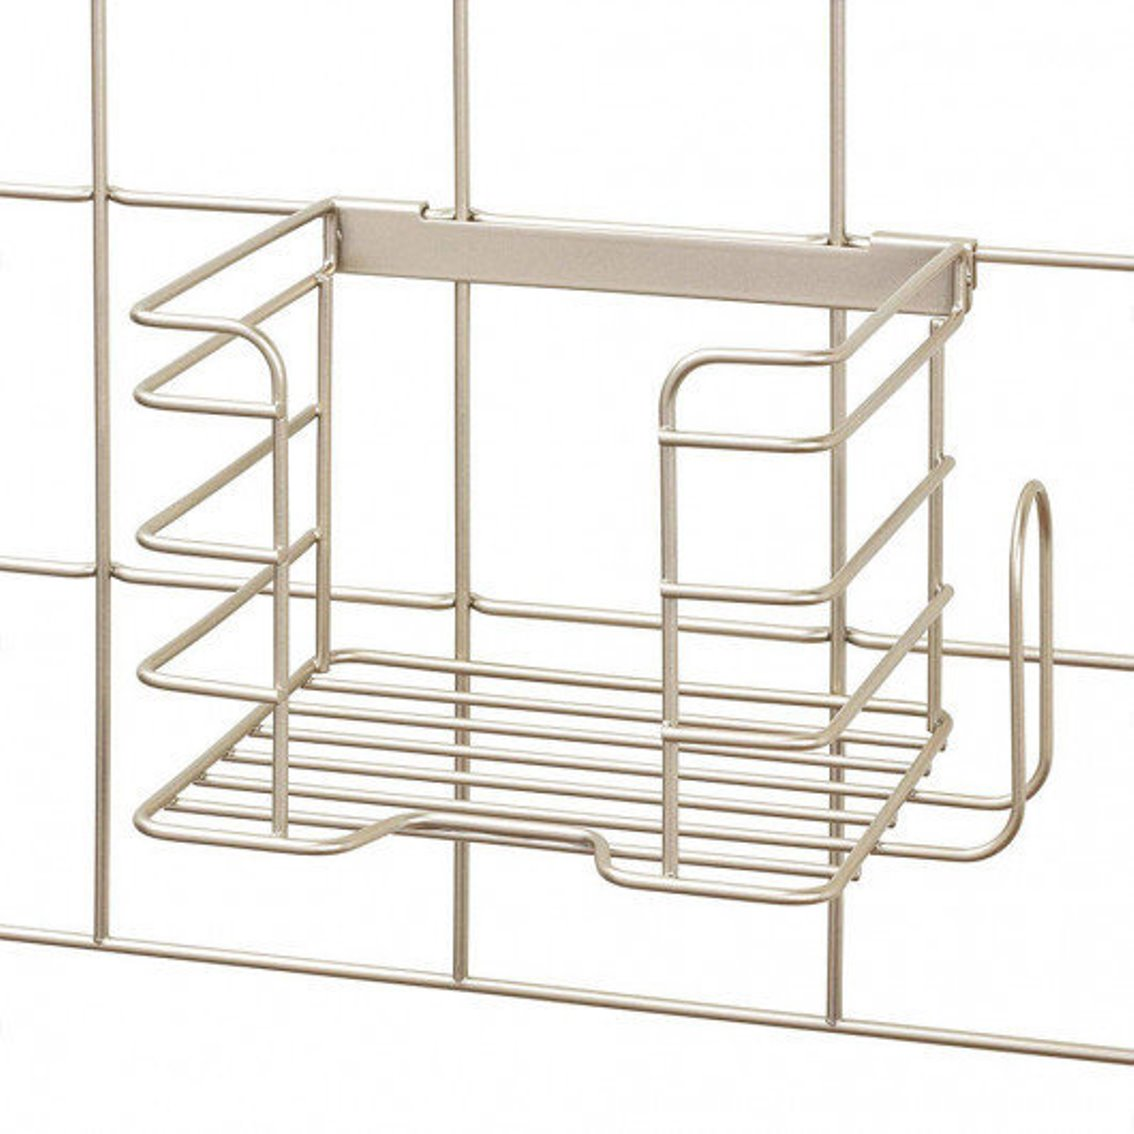 Онлайн каталог PROMENU: Органайзер настенный металлический для утюга iDesign JAYCE, 20,8х15,3х15,1 см, бежевый Interdesign 08105EU